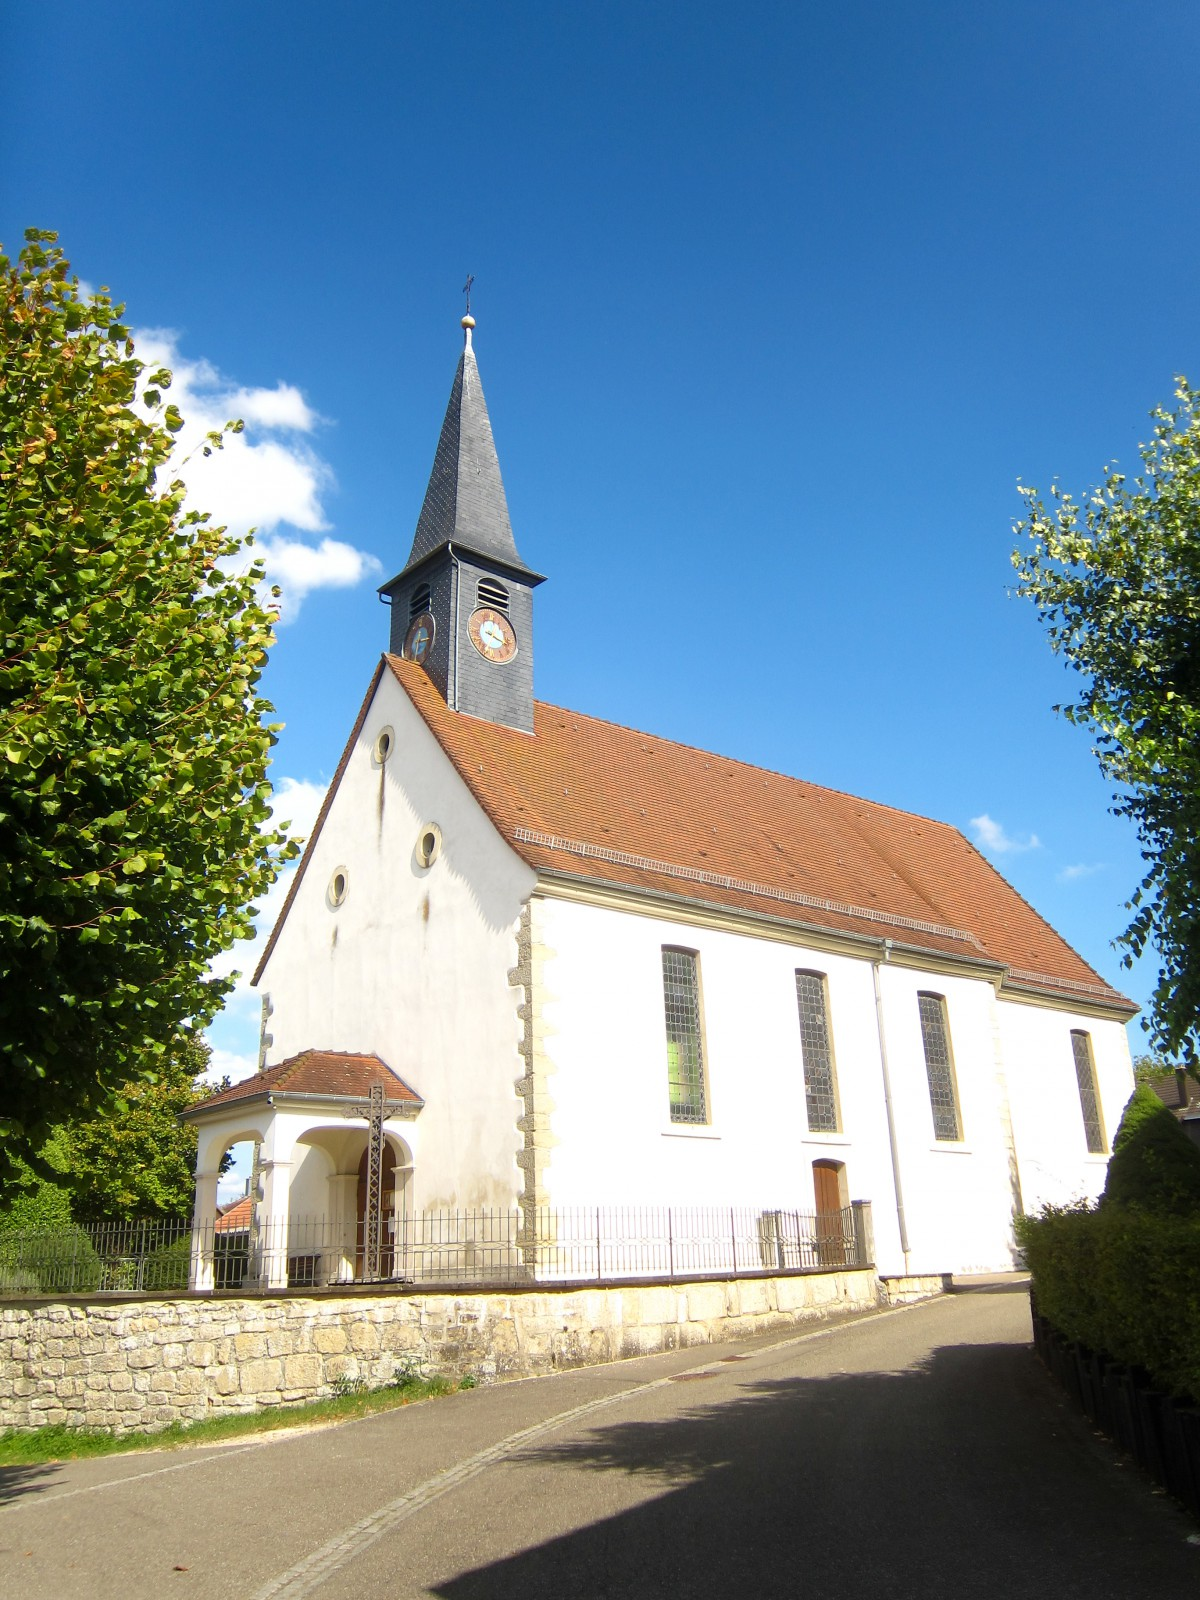 Neuwiller Church © Vianney-MULLER